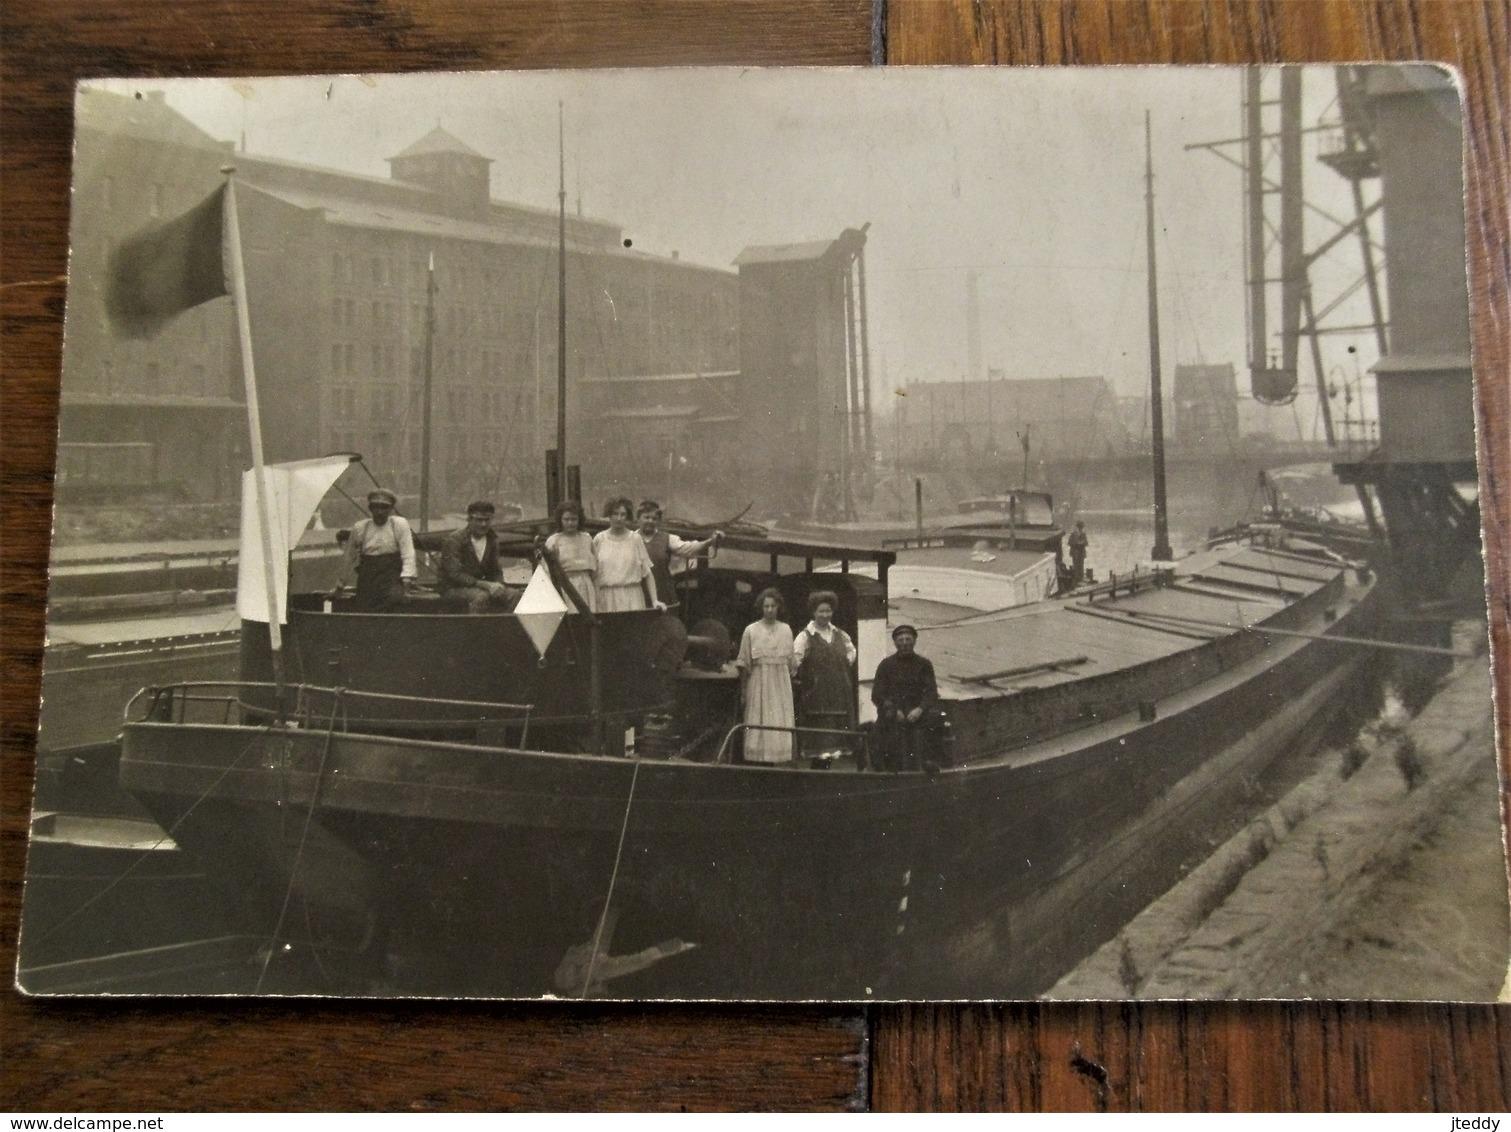 Oude FOTO-KAART Schippersvolk Op Hun Vrachtboten - Commerce